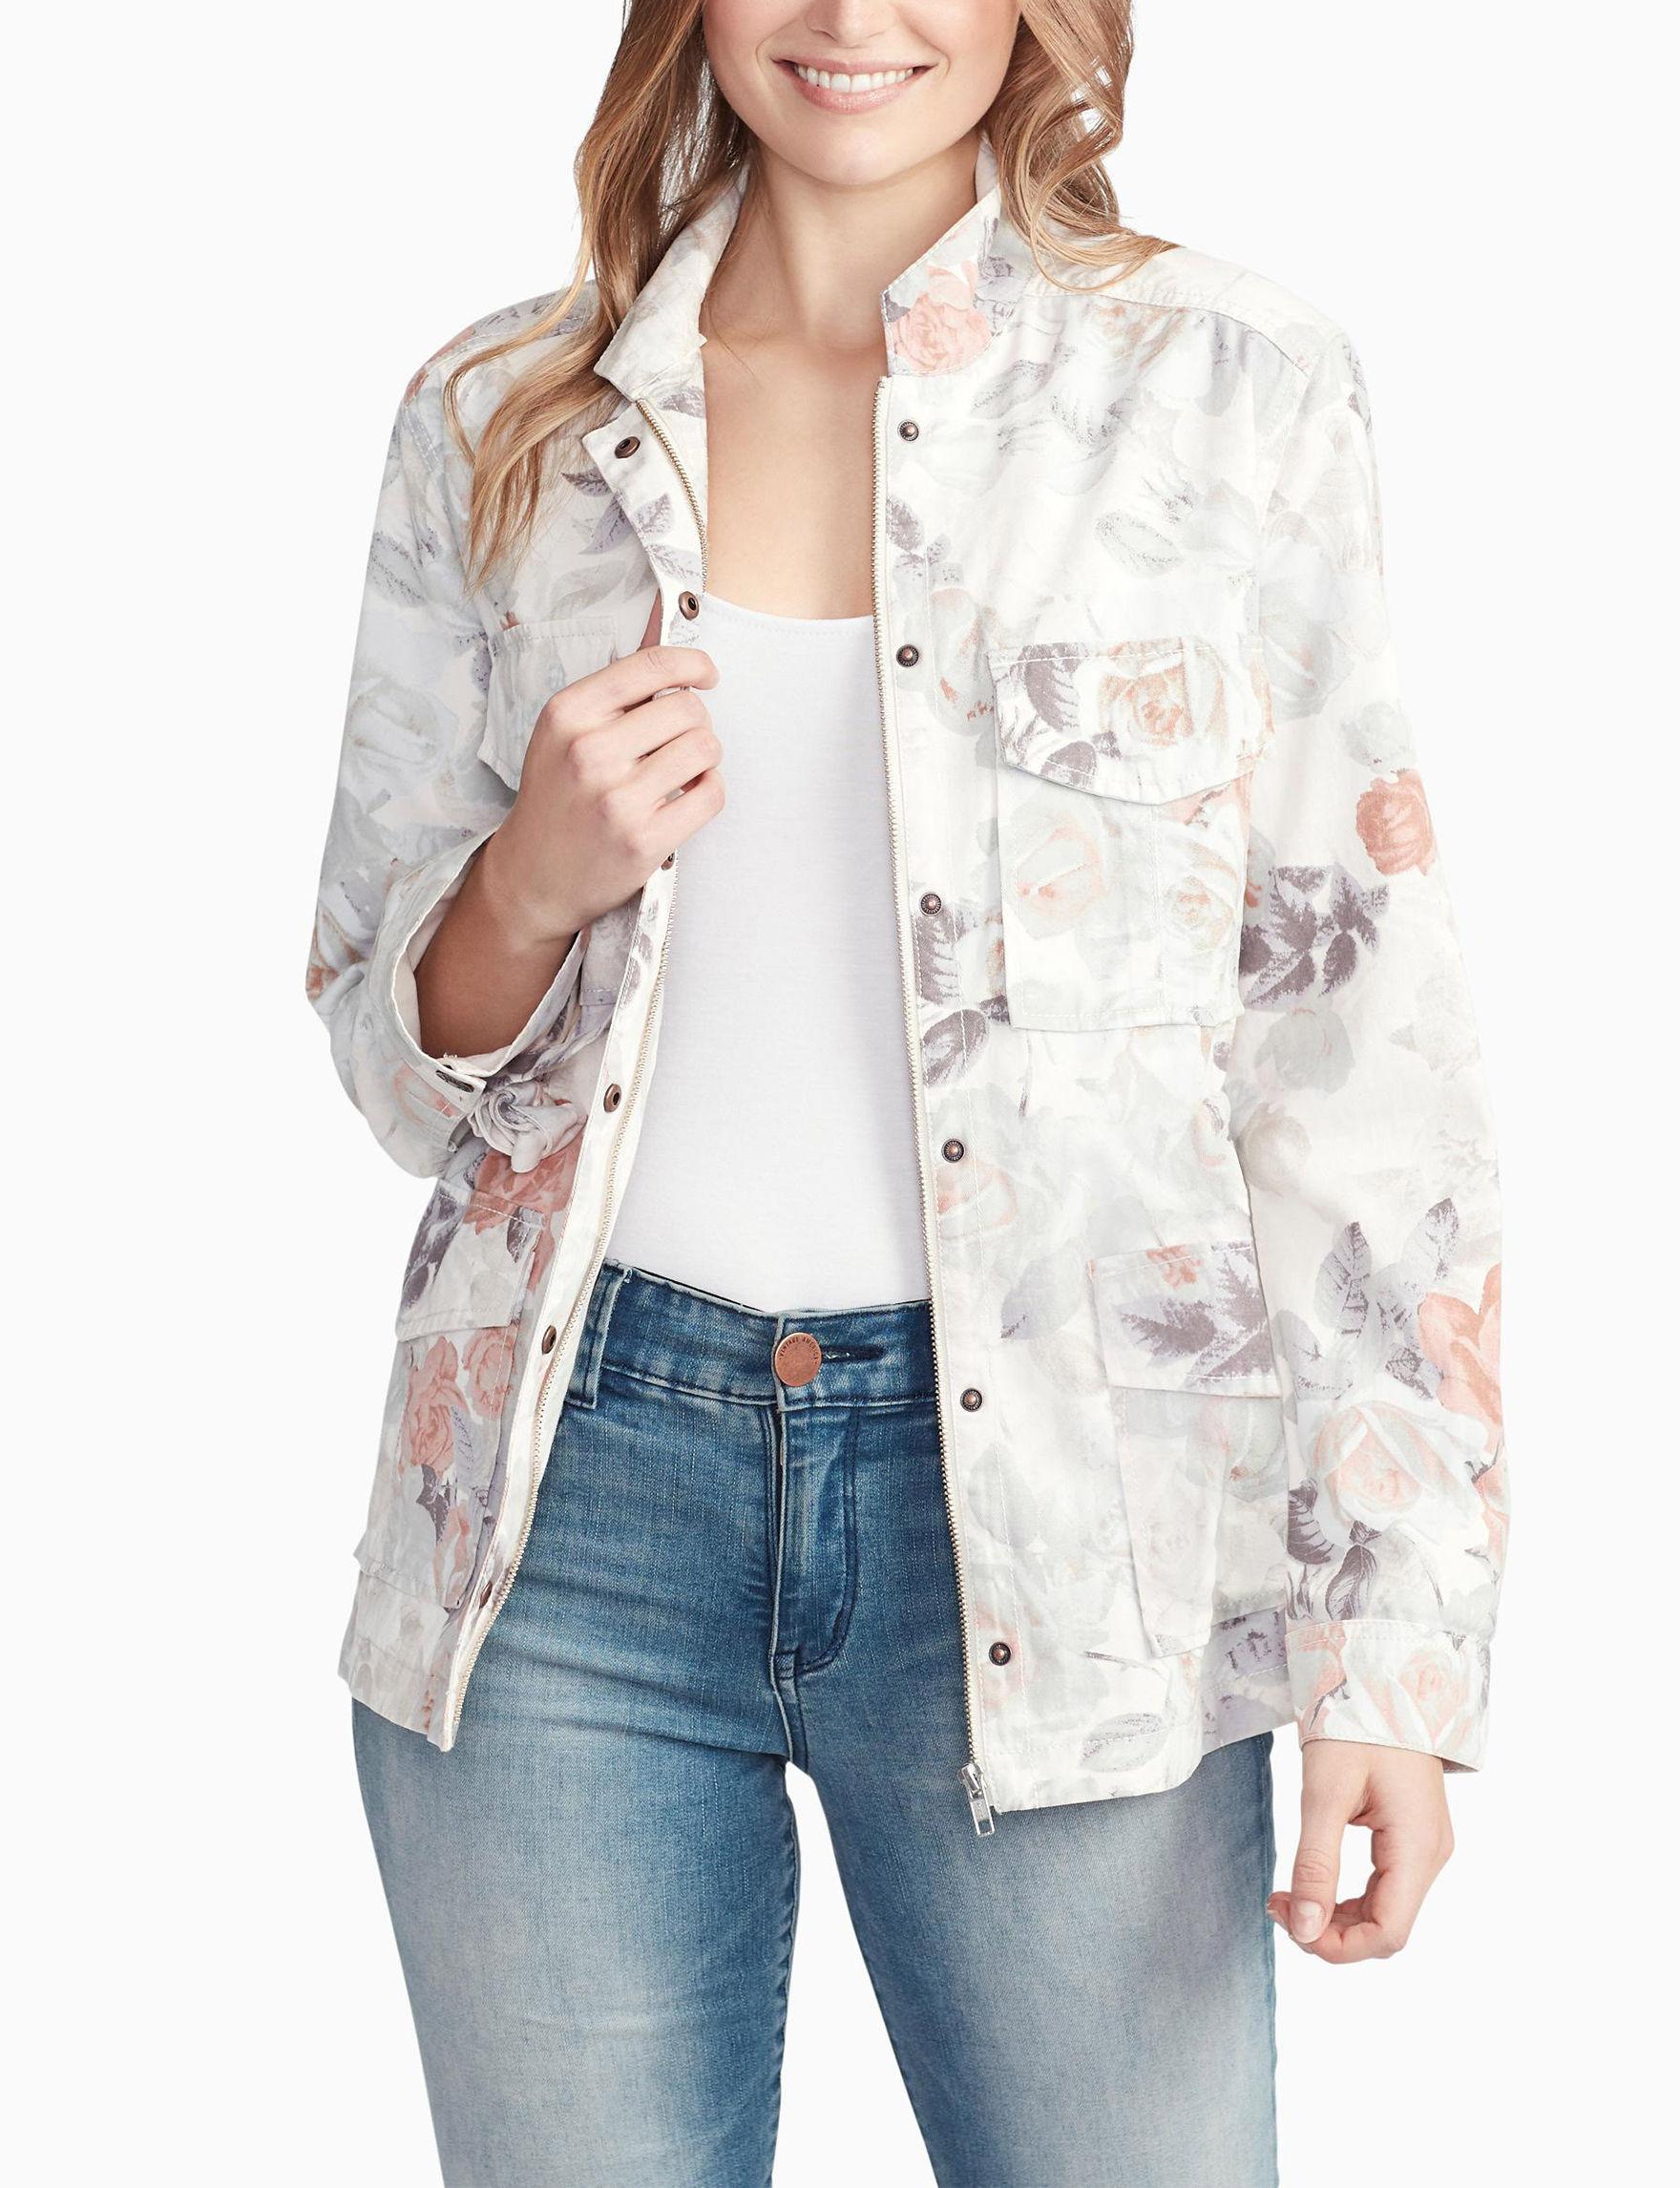 Vintage America Blues White Floral Lightweight Jackets & Blazers